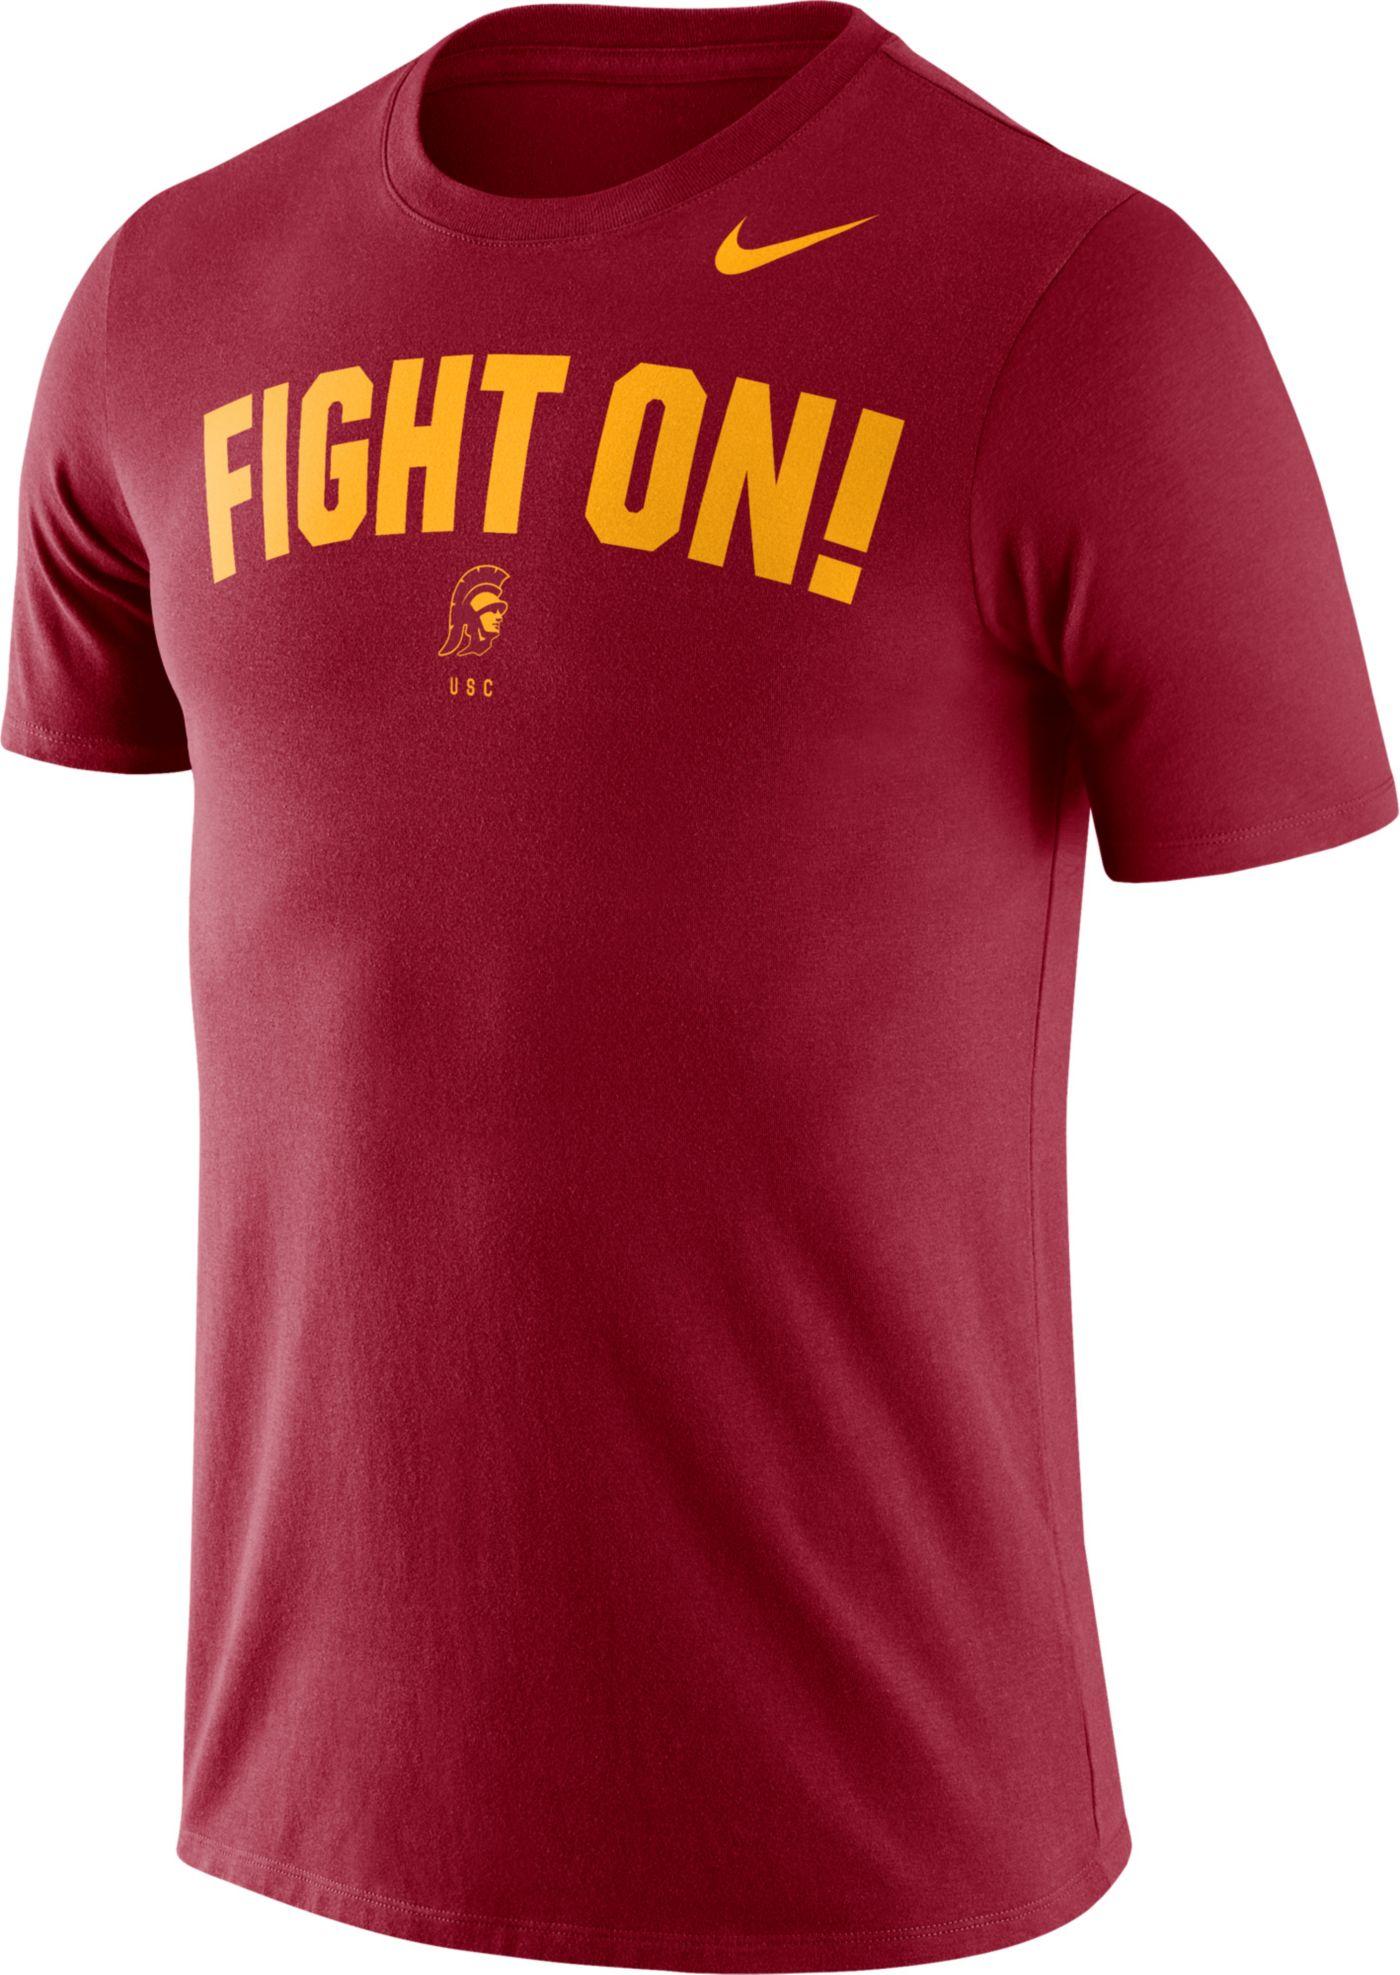 Nike Men's USC Trojans Cardinal Dri-FIT Phrase T-Shirt